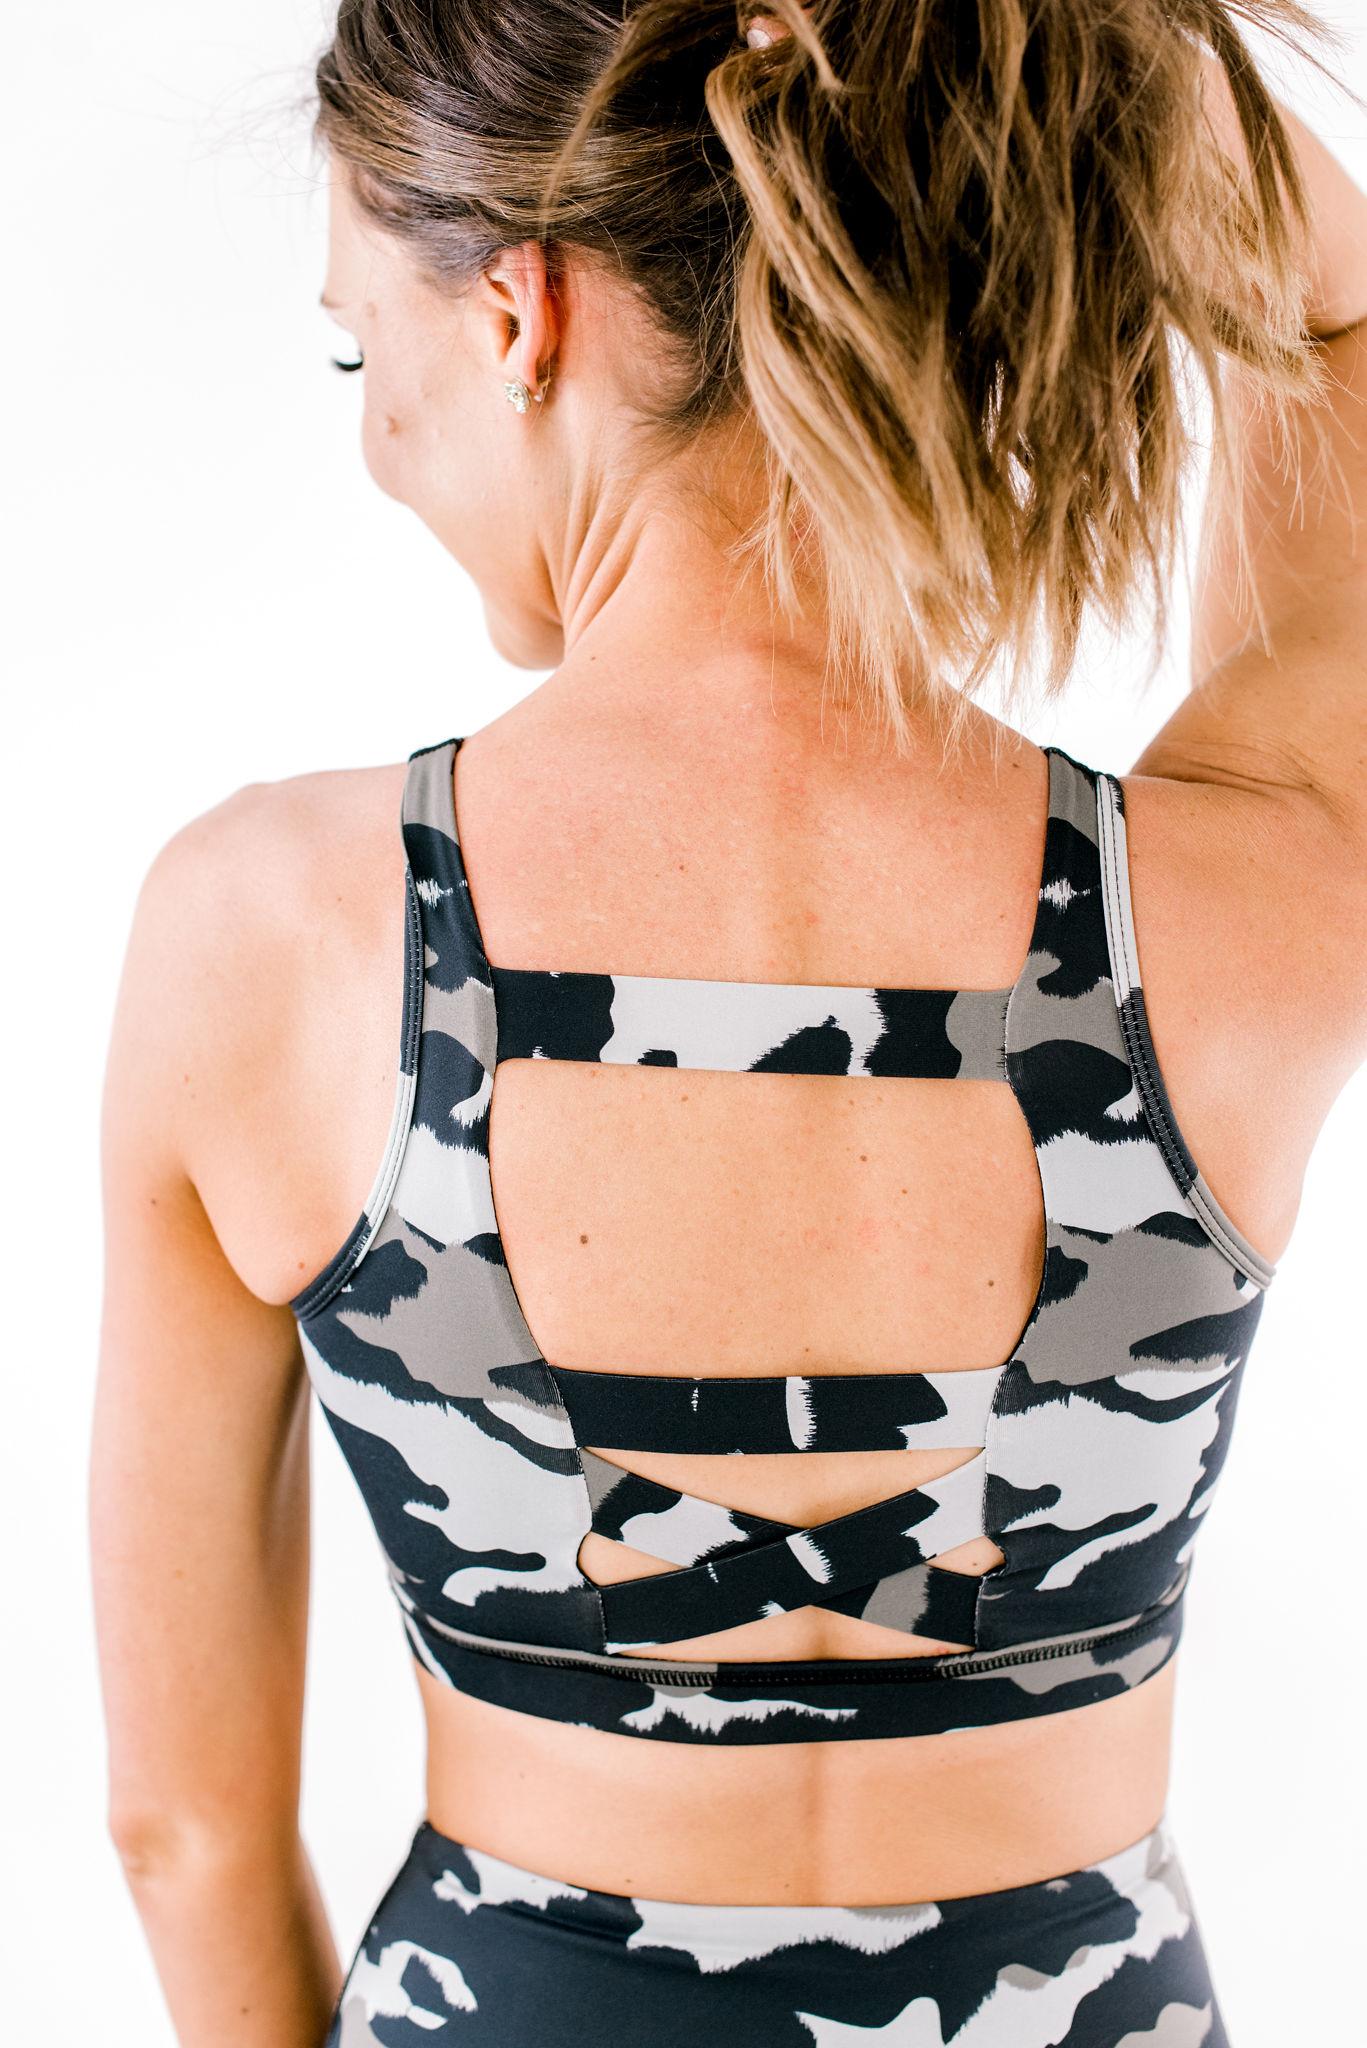 camo sports bra, activewear for women, athleisure, shop style your senses